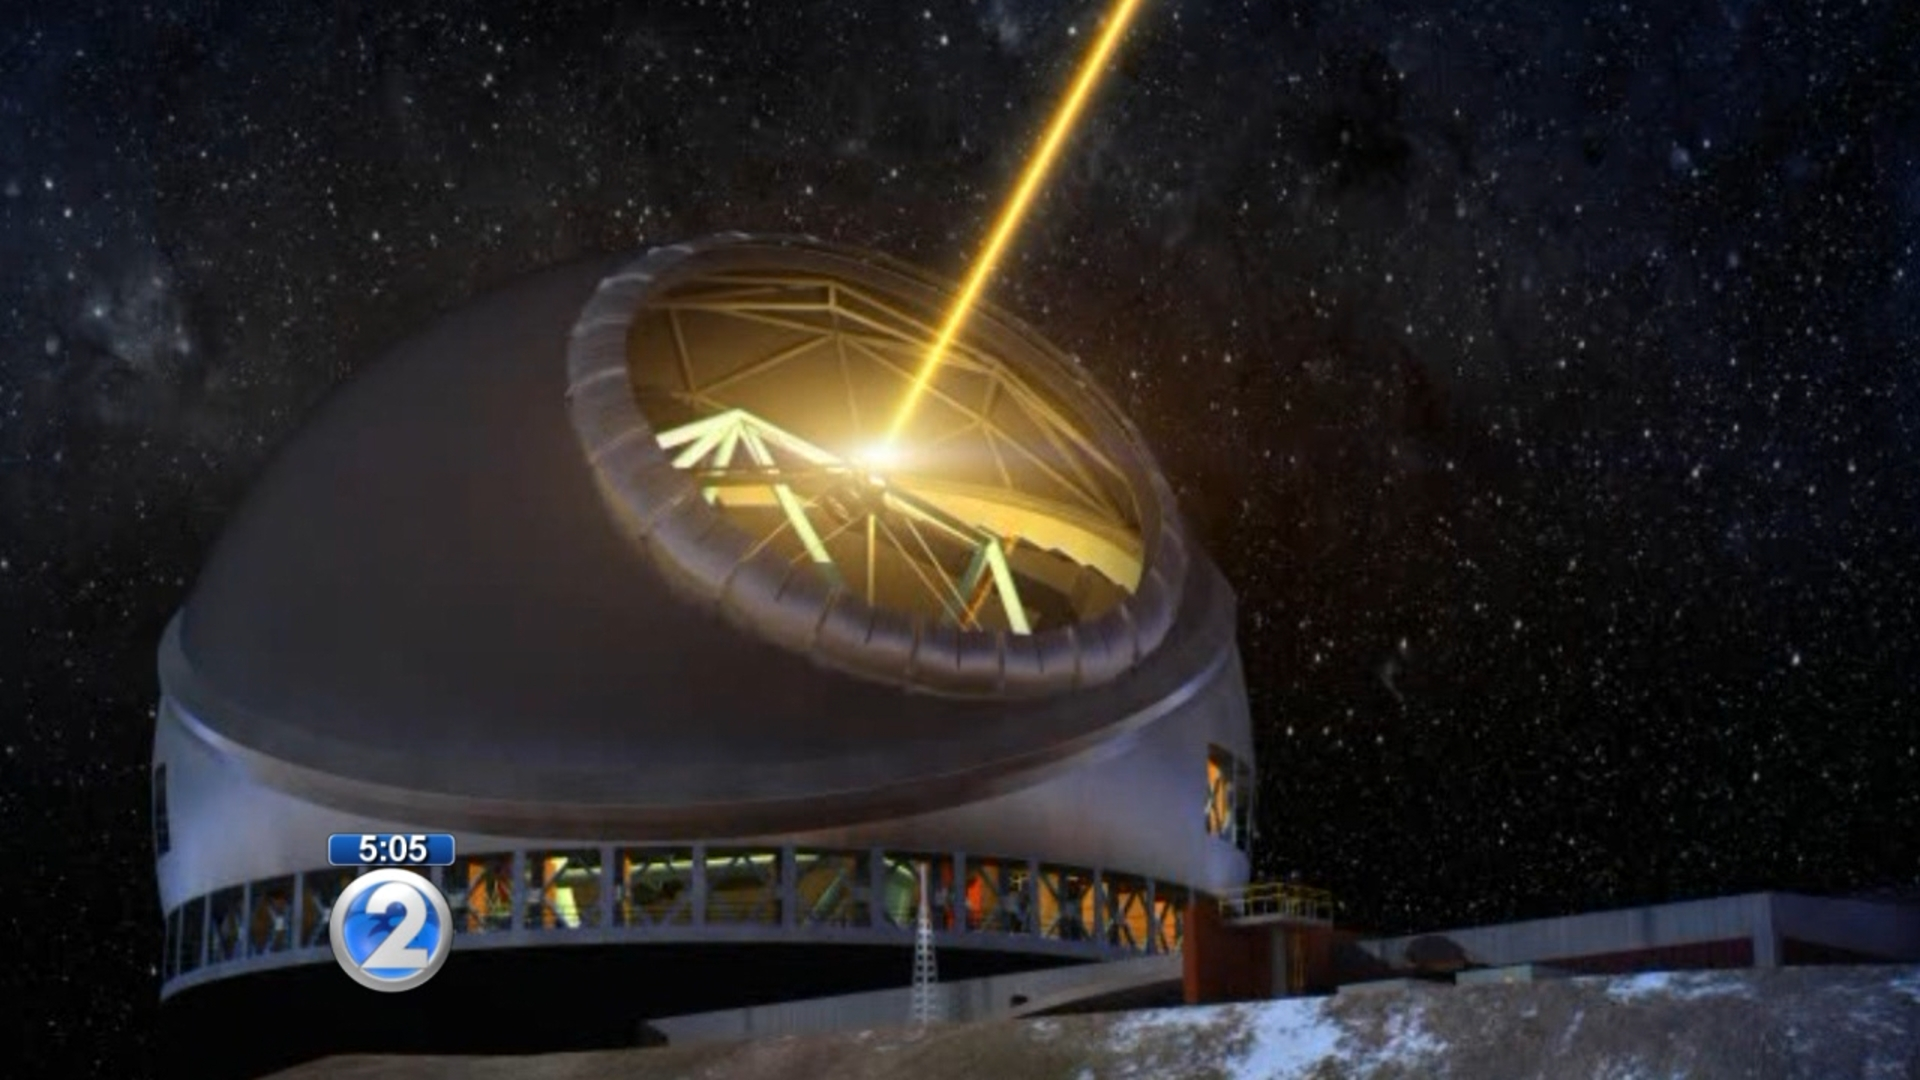 Hawaii Supreme Court invalidates permit to build Thirty Meter Telescope